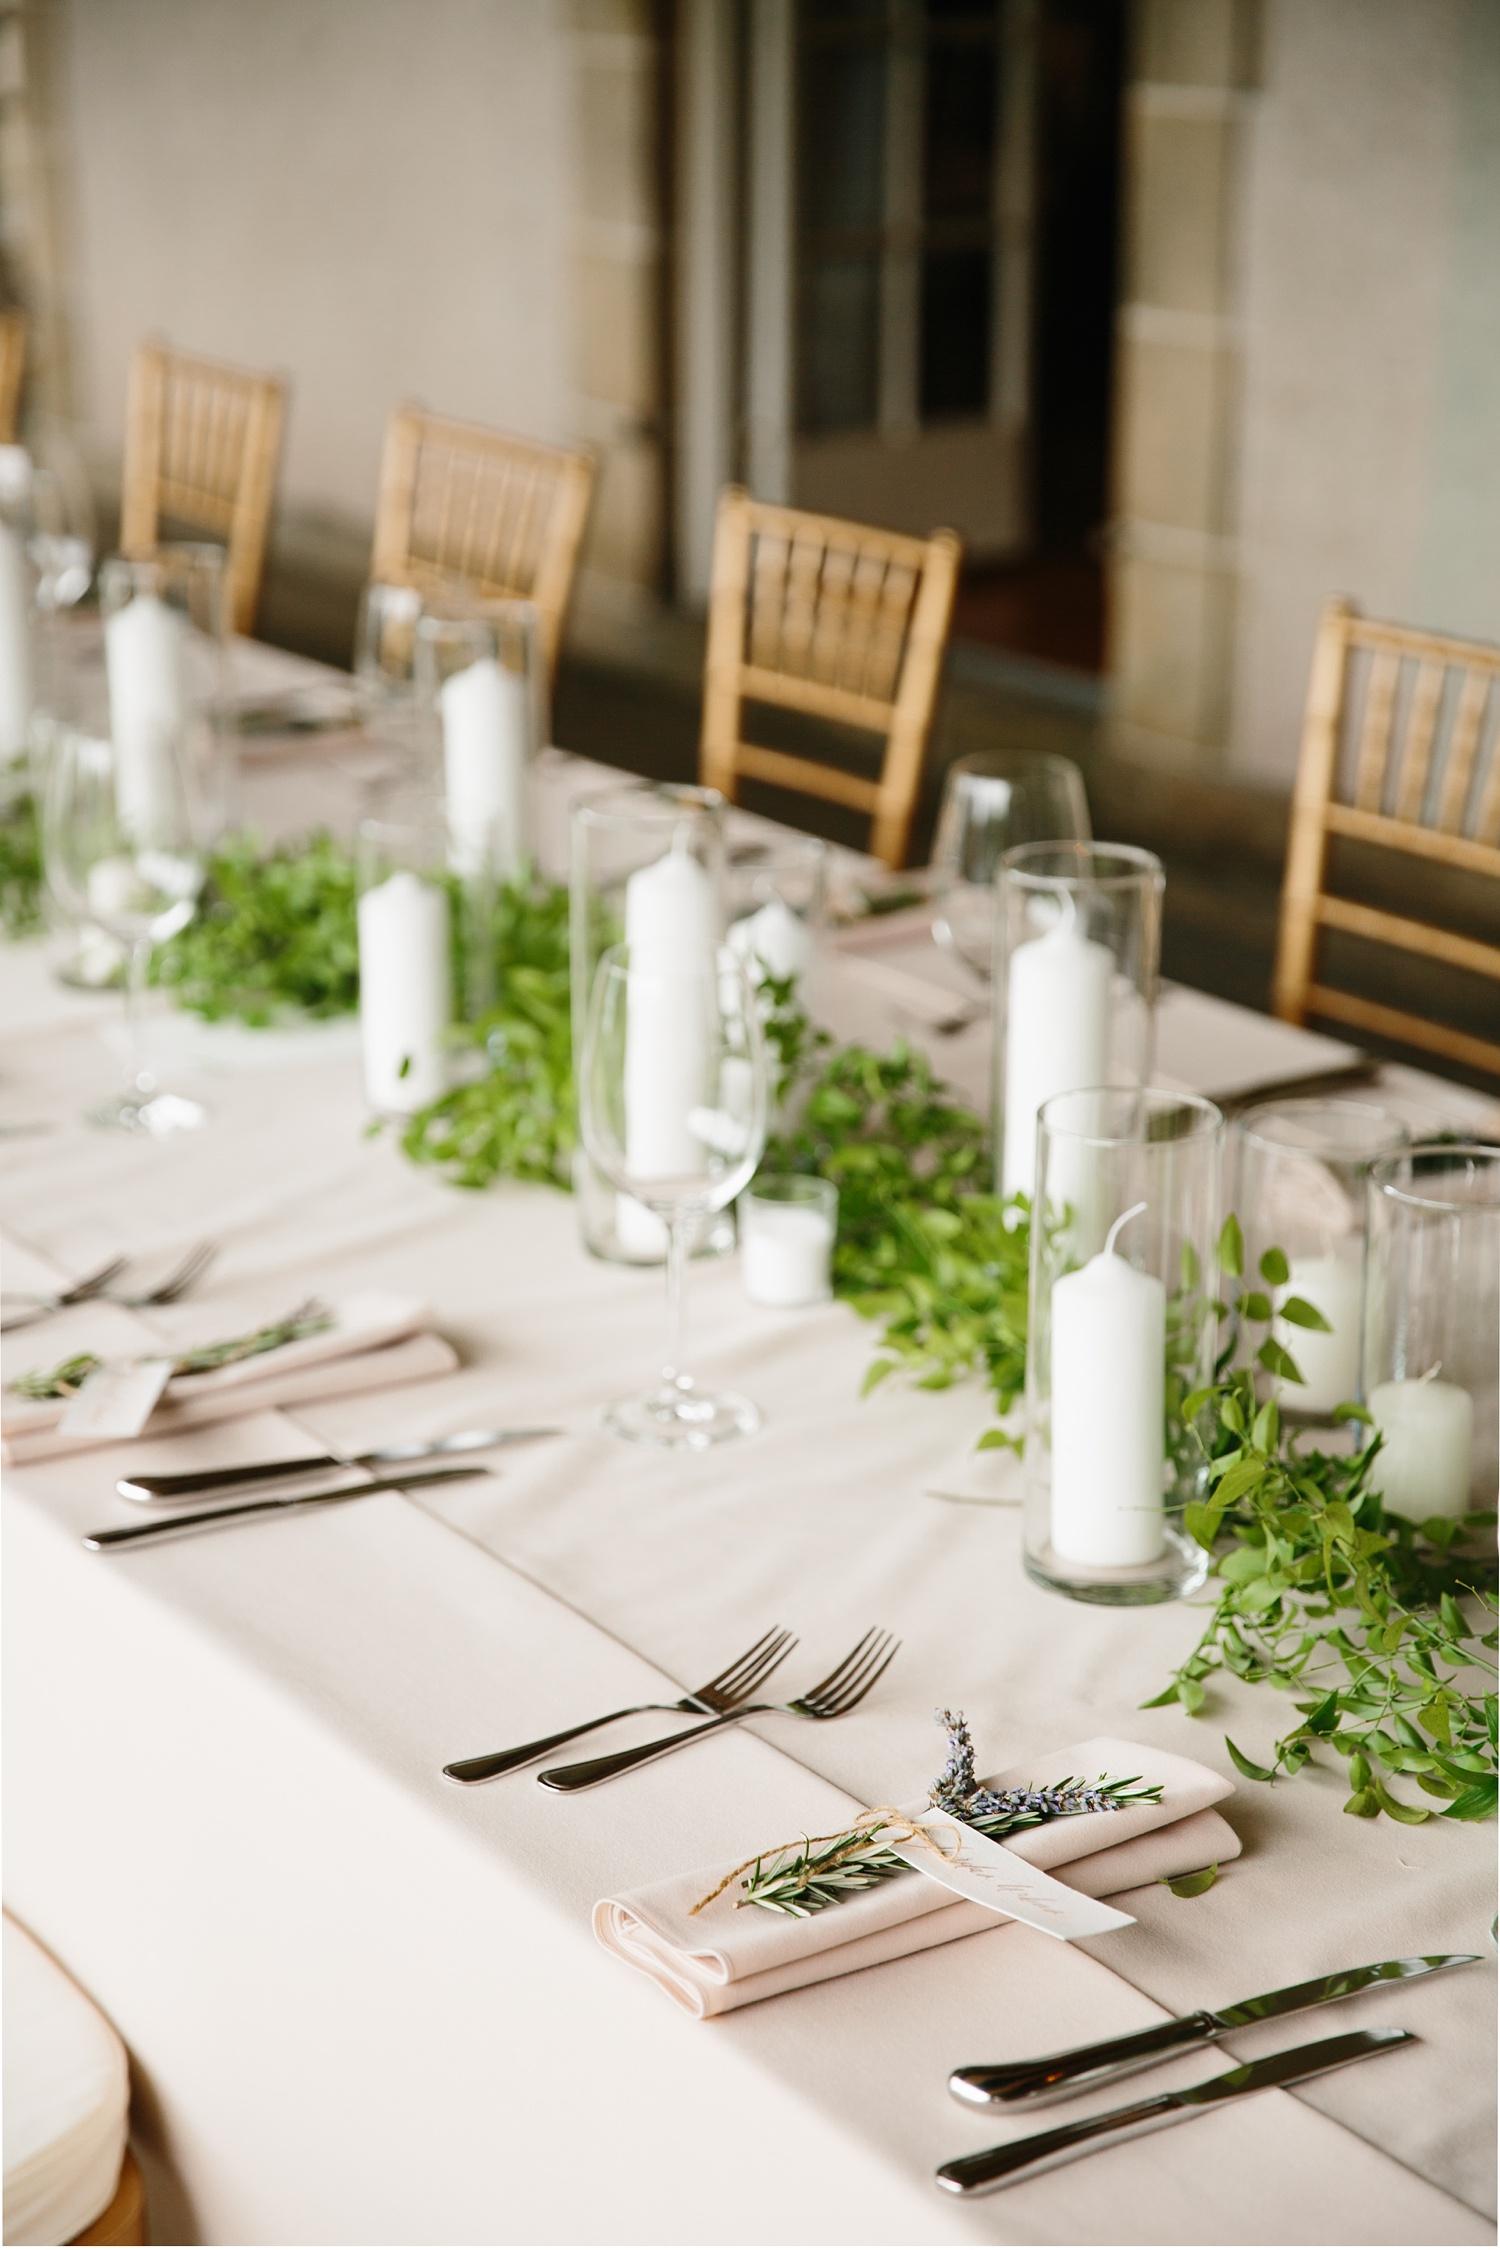 Daniel_Sarah_Glen_Manor_House_Wedding_016.jpeg